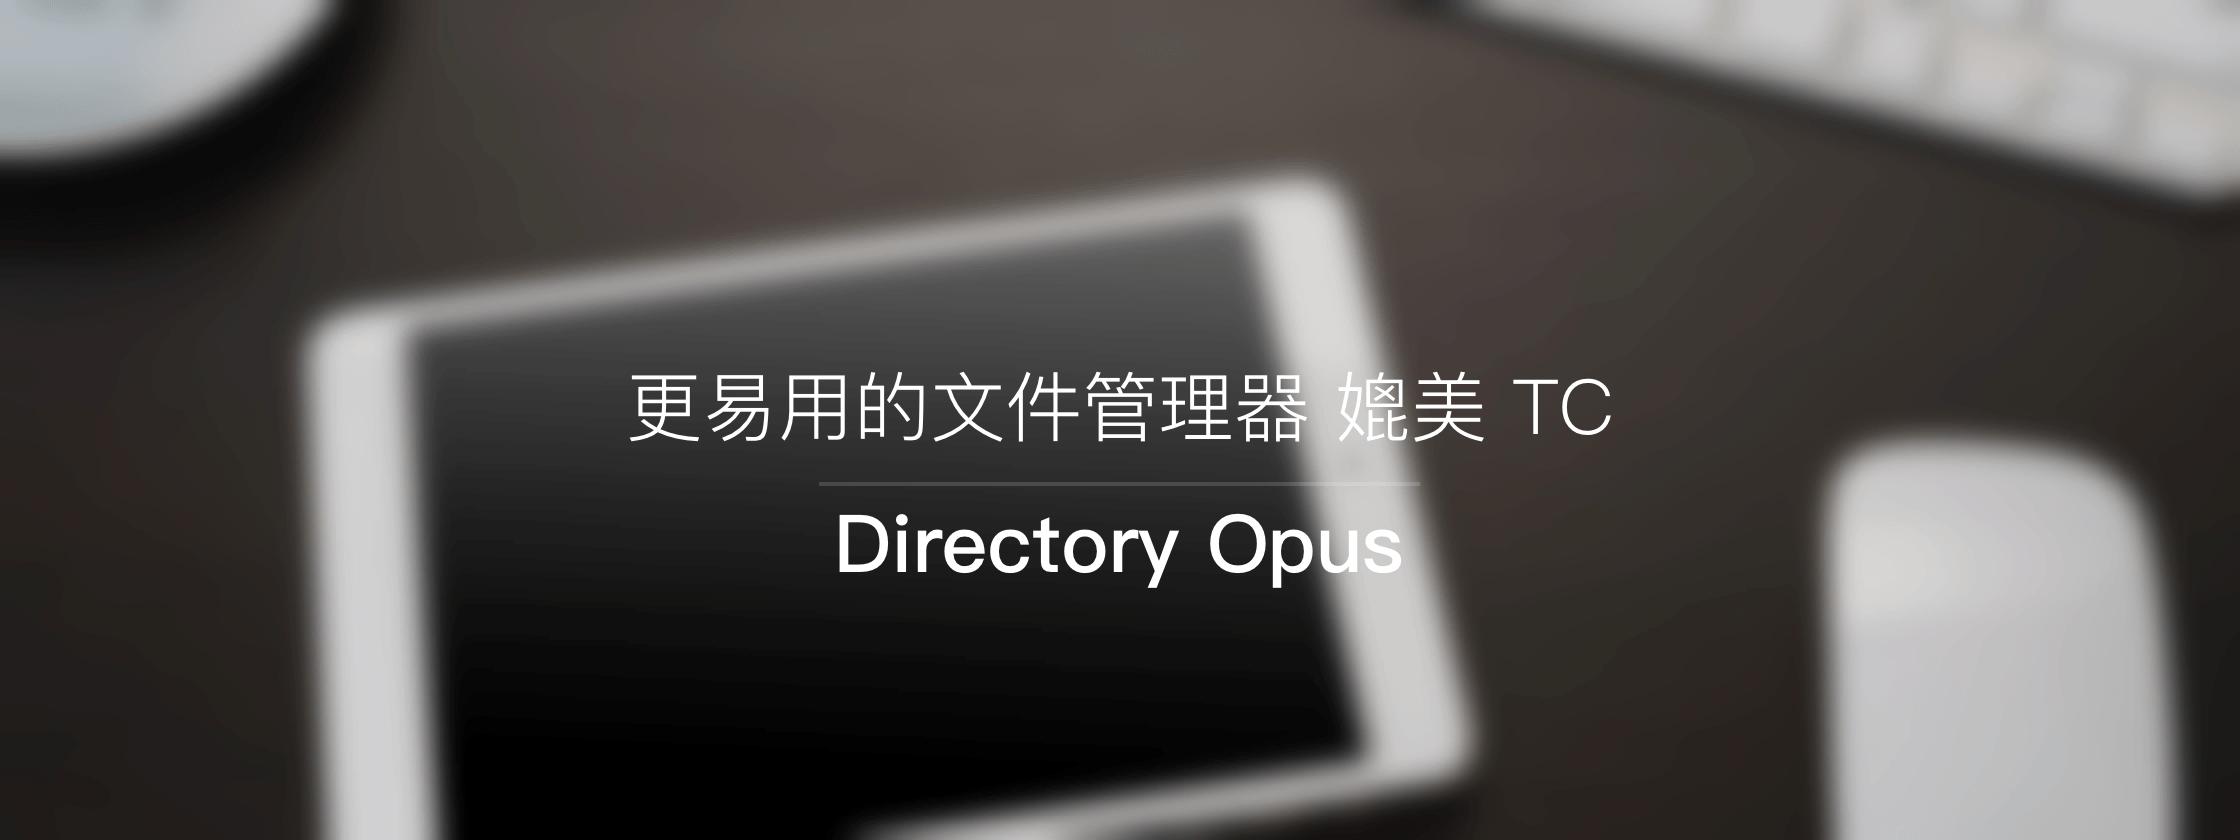 Directory Opus – 更易用的文件管理器 媲美 TC